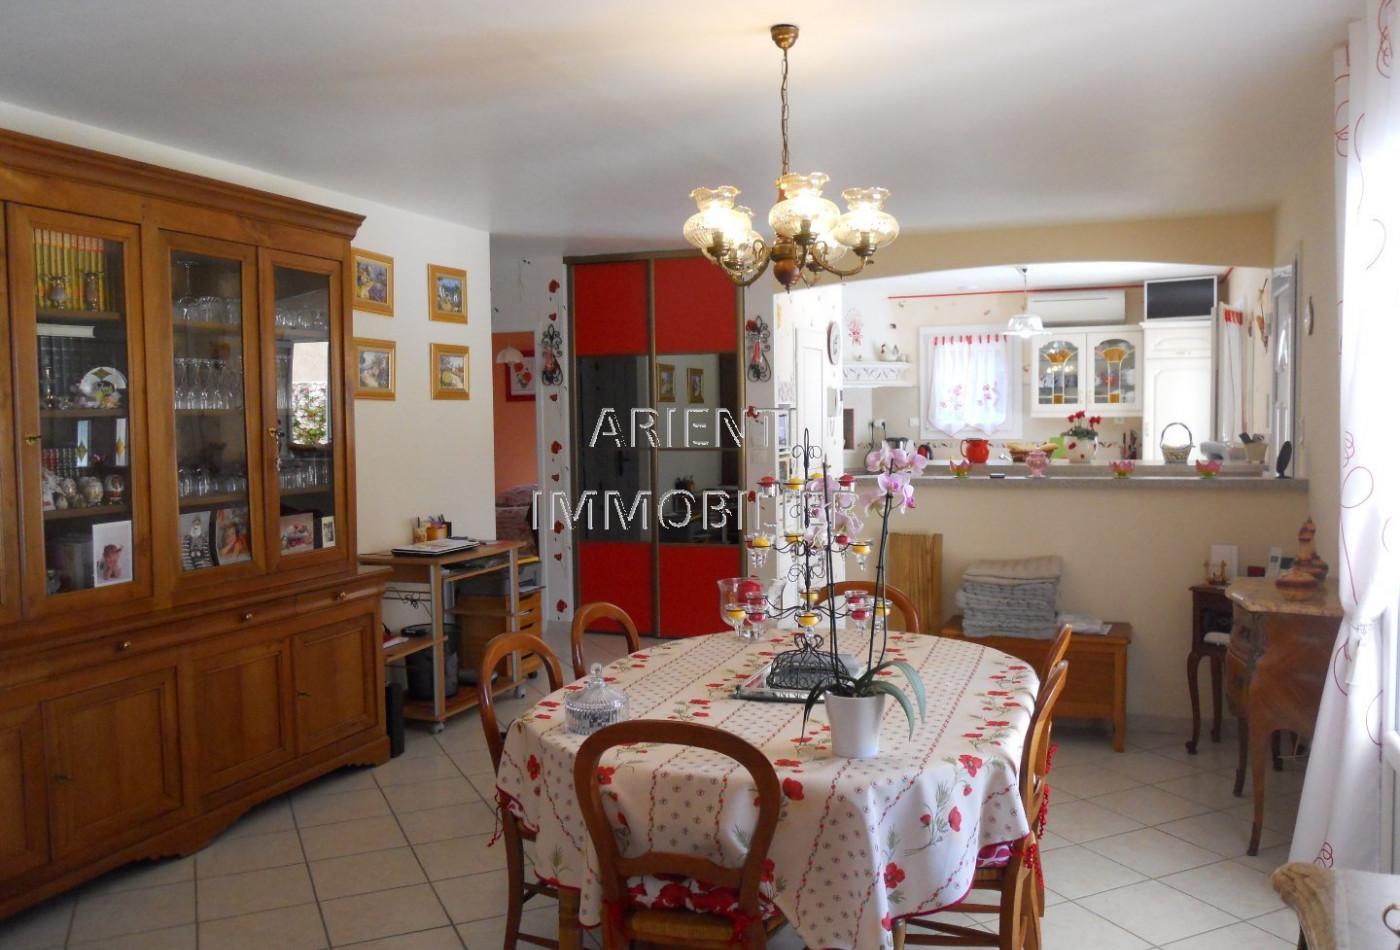 A vendre  Taulignan | Réf 260013069 - Office immobilier arienti